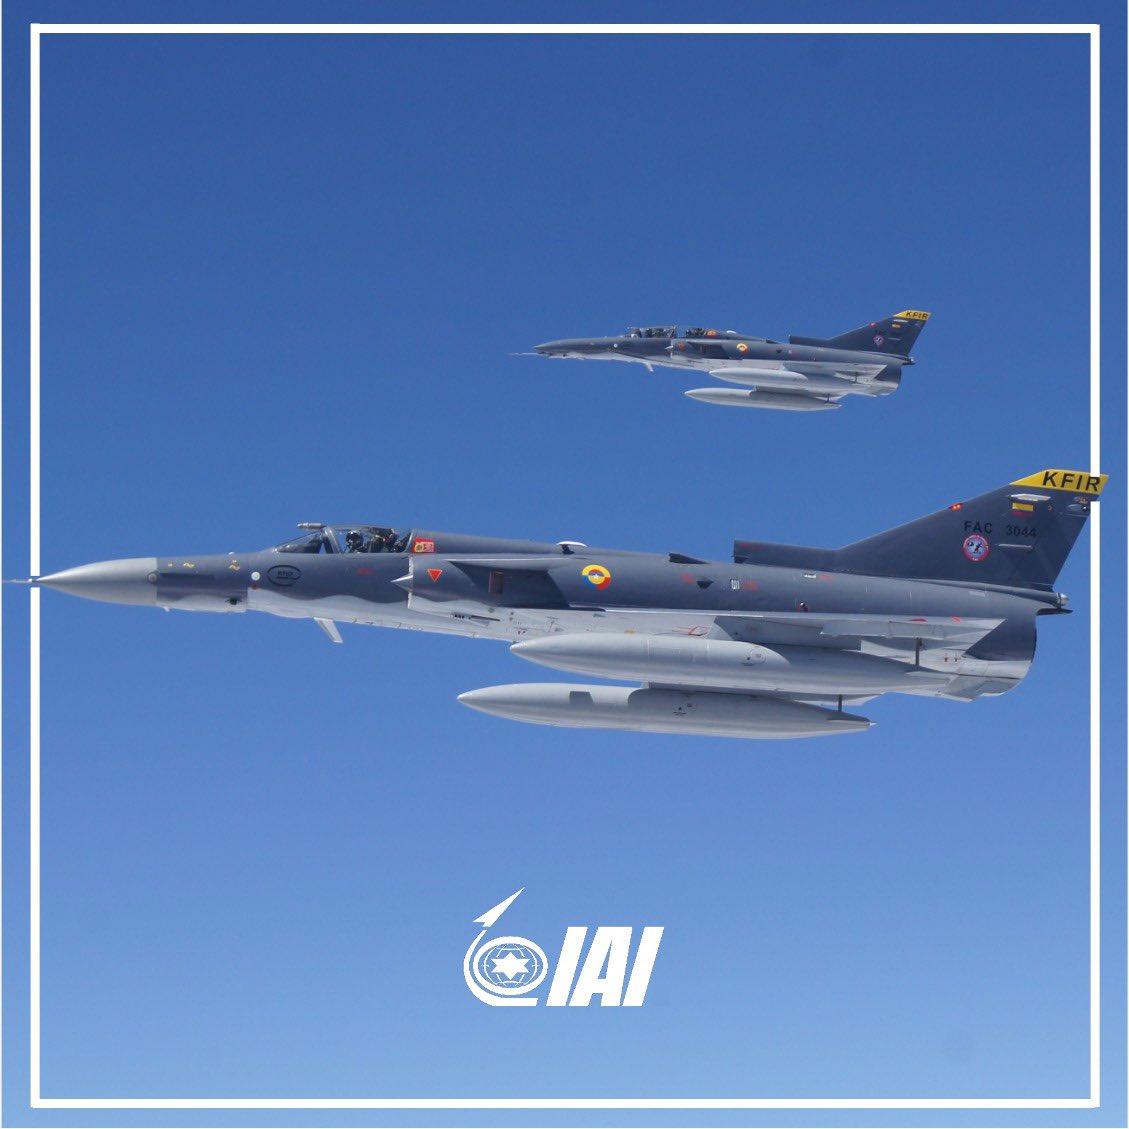 Sri Lankan Kfir jets